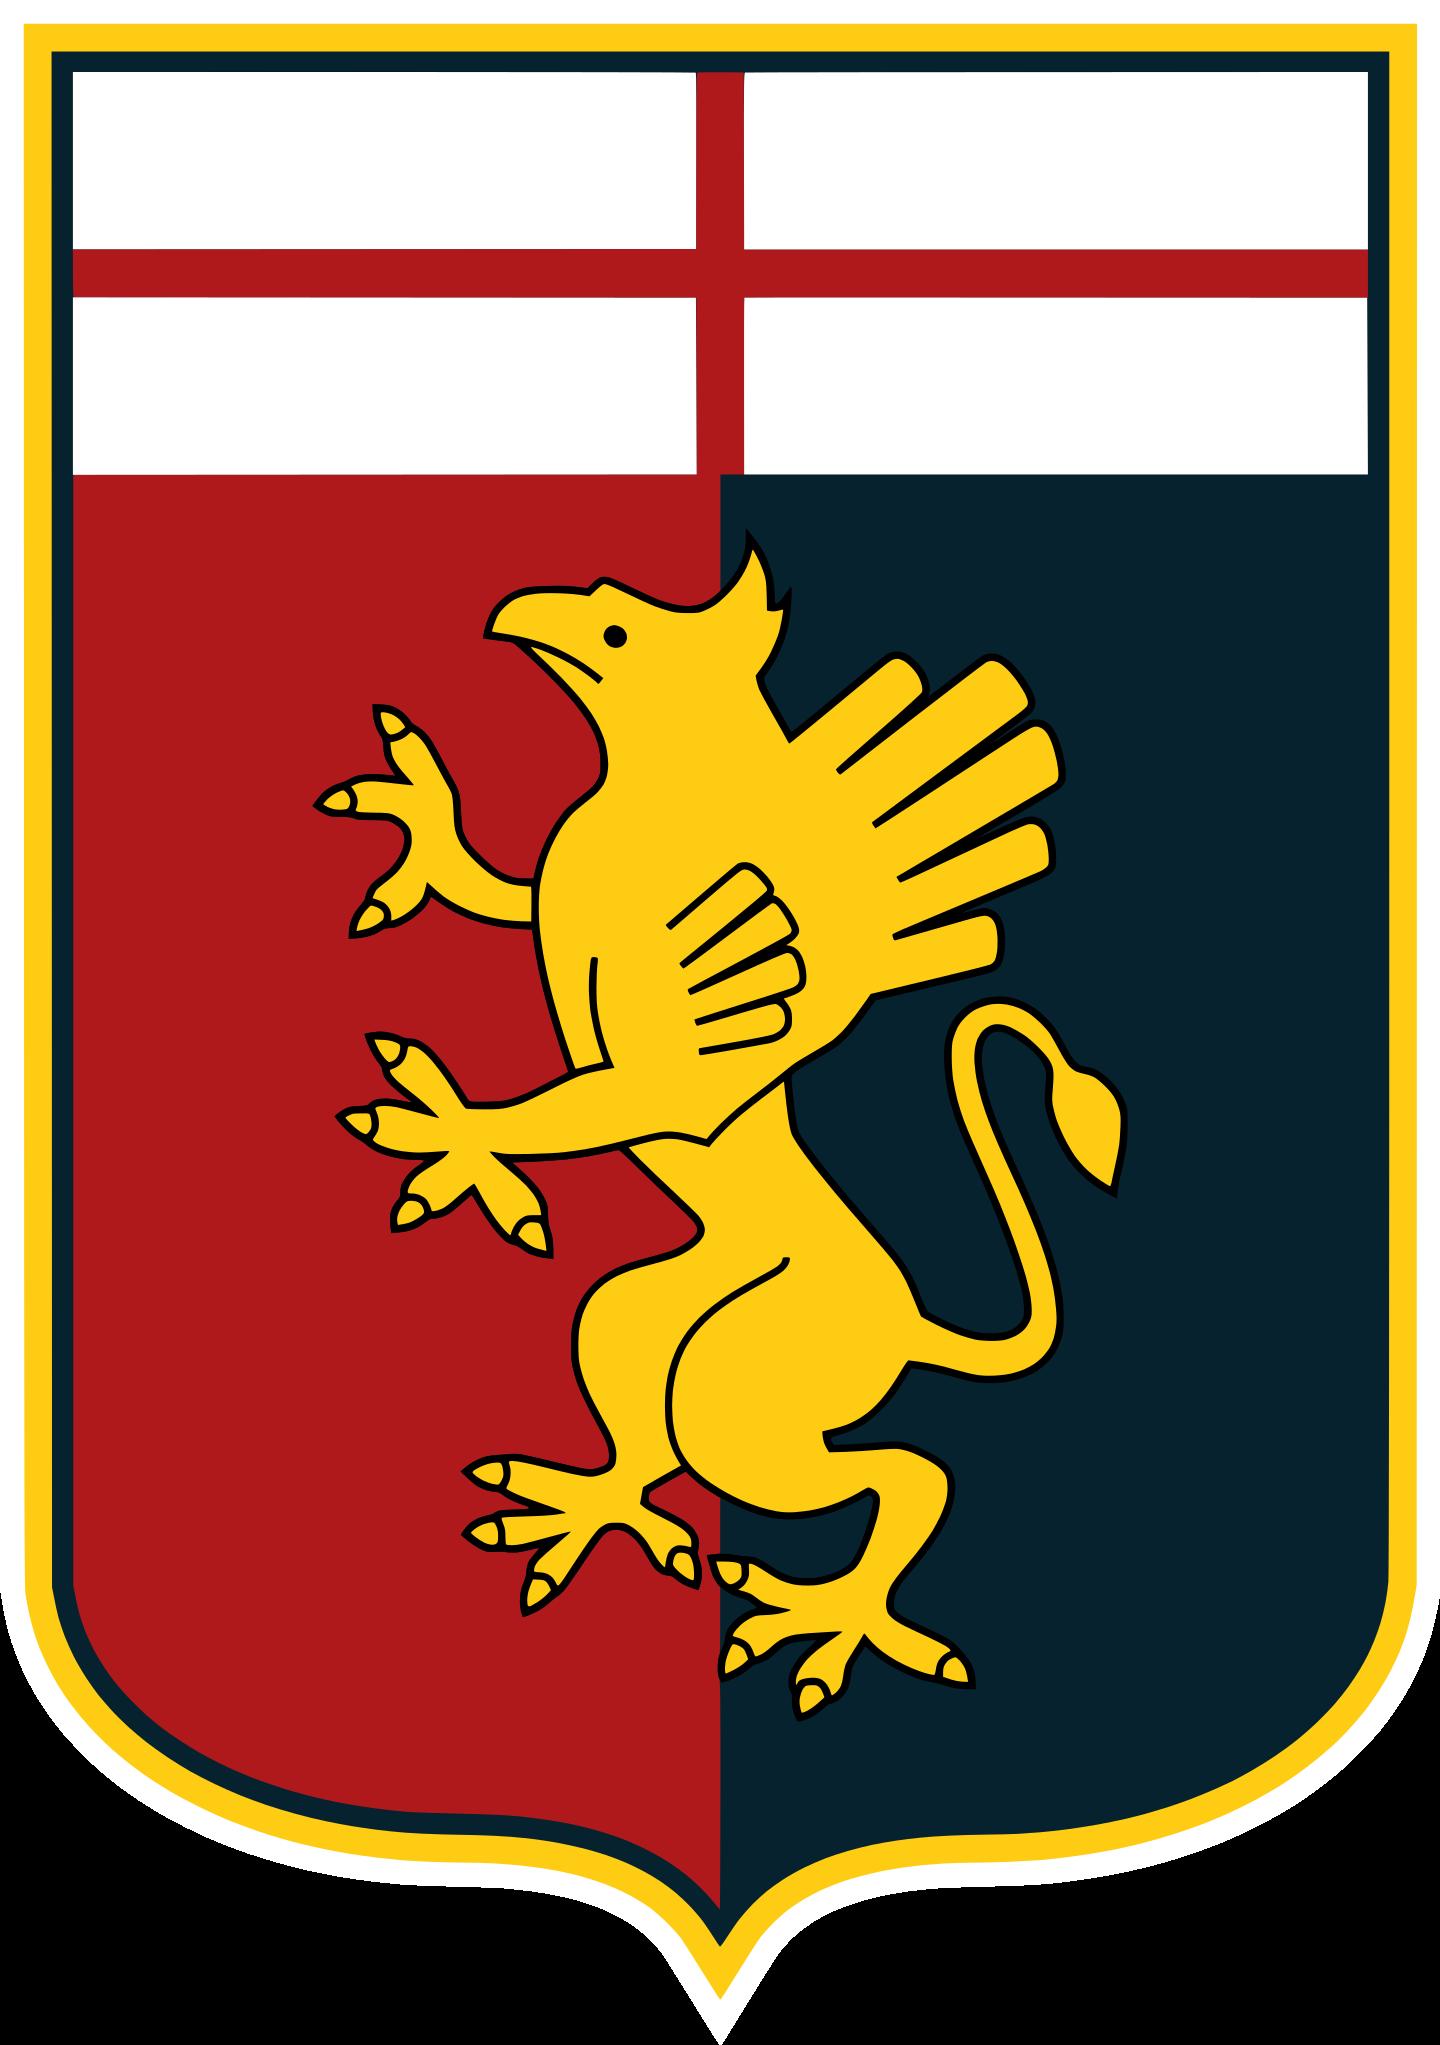 genoa fc logo 2 - Genoa FC Logo